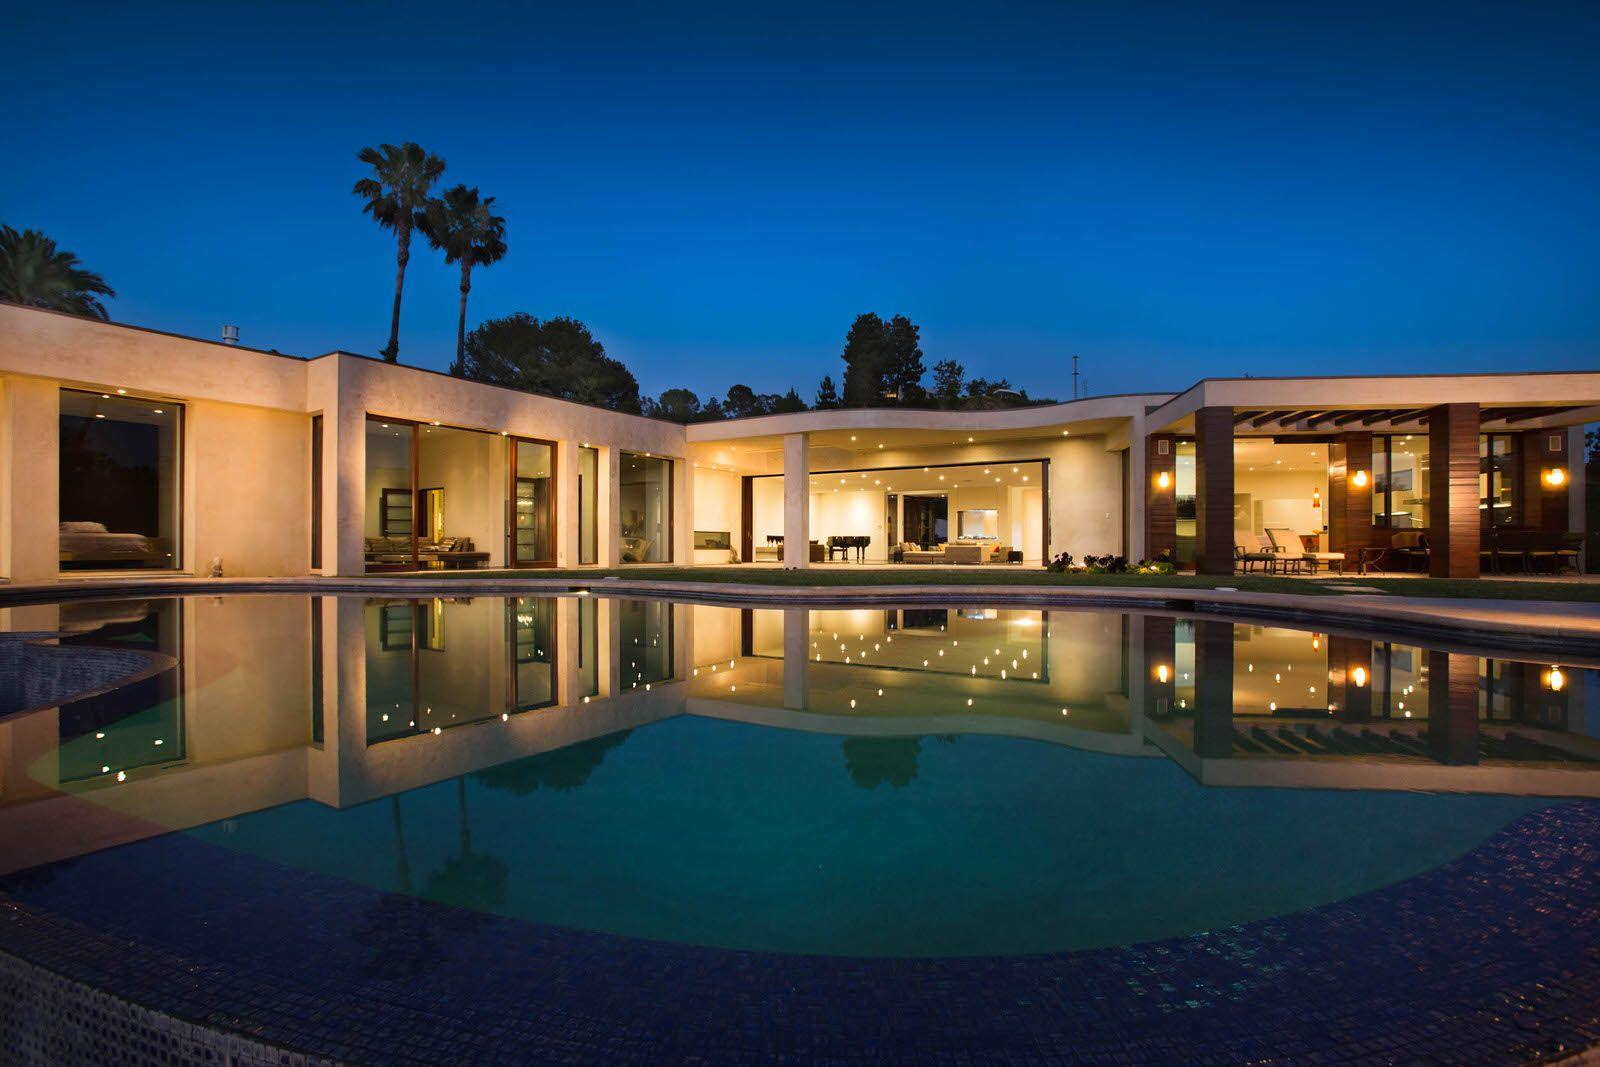 Best Kitchen Gallery: Luxury Rental In Beverly Hills Castle Place Beverly Hills Los of Beverly Hills California Homes on rachelxblog.com